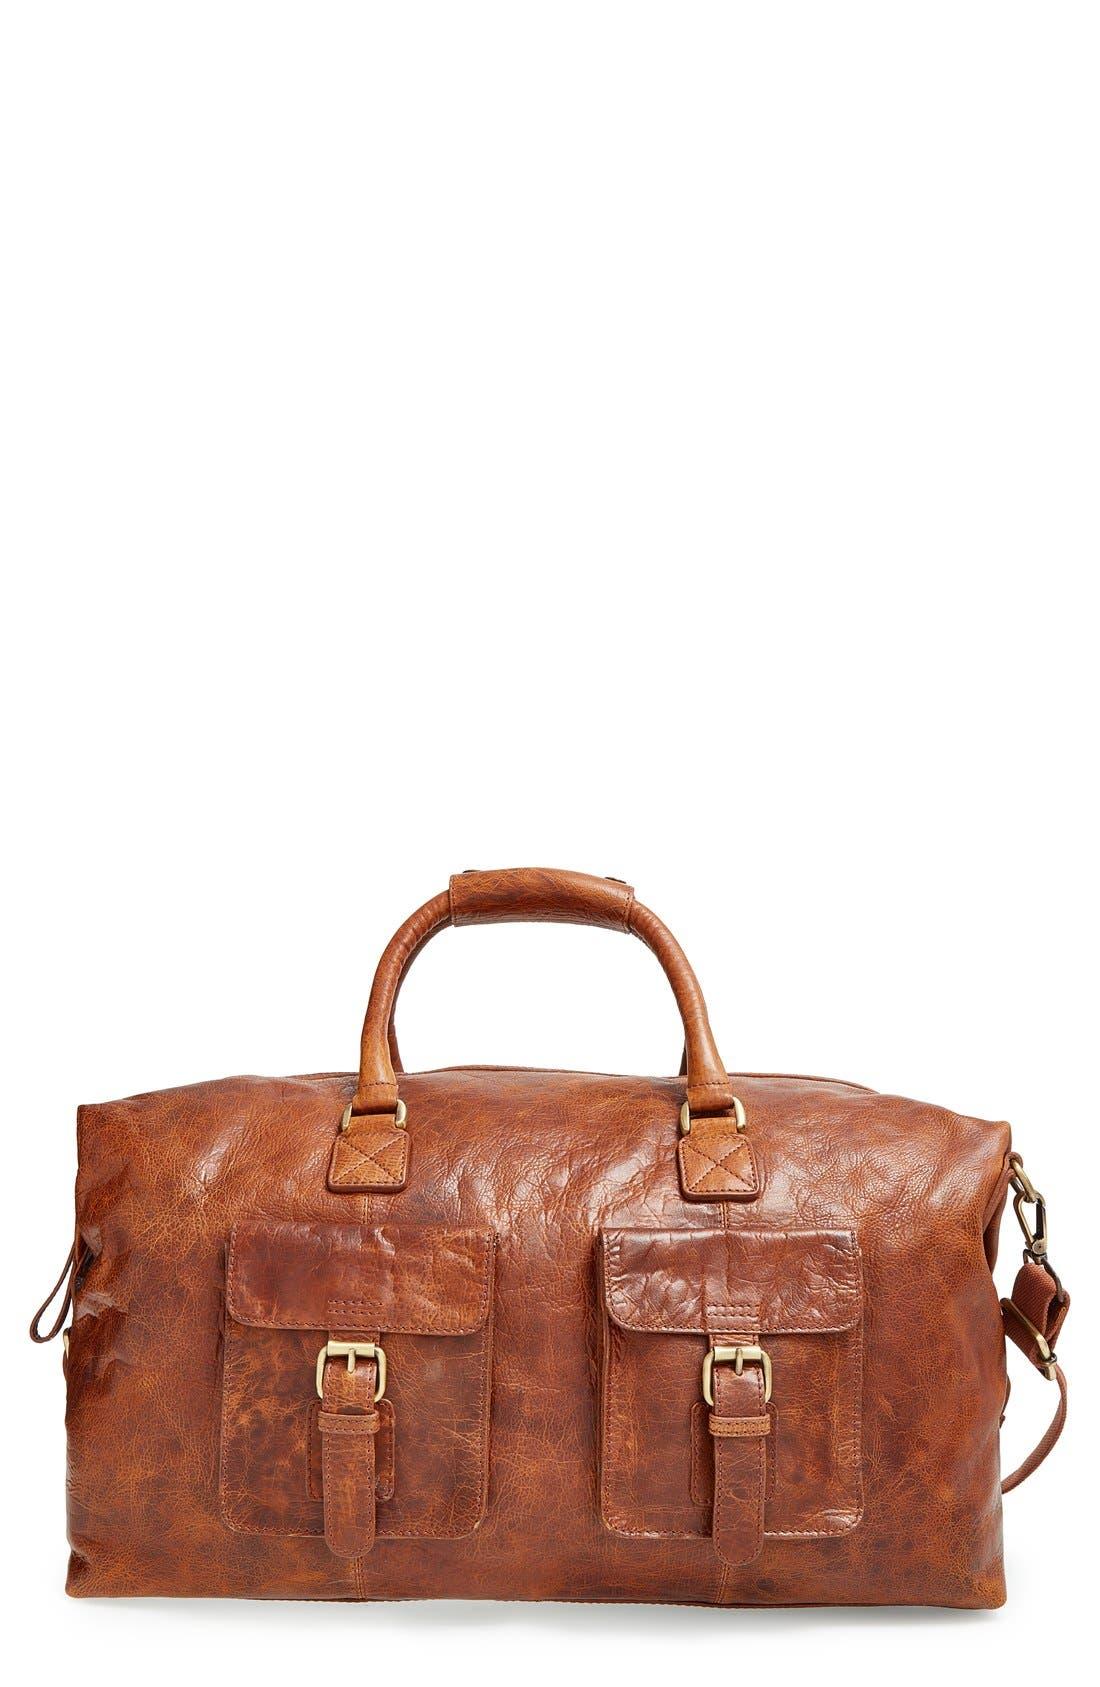 'Rugged' Leather Duffel Bag,                             Main thumbnail 1, color,                             COGNAC